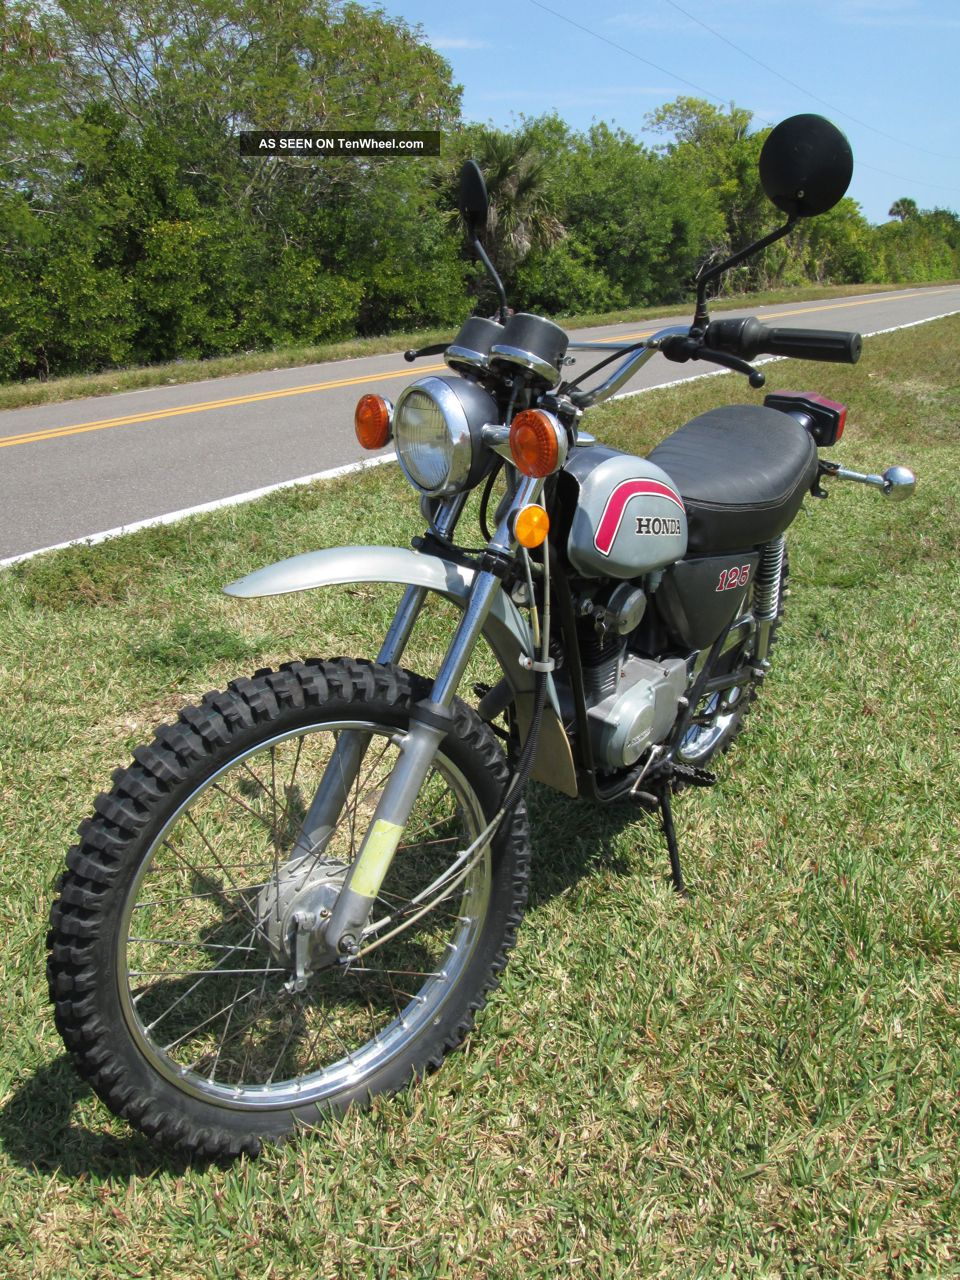 Enduro Vintage Motorcycles for sale  SmartCycleGuidecom